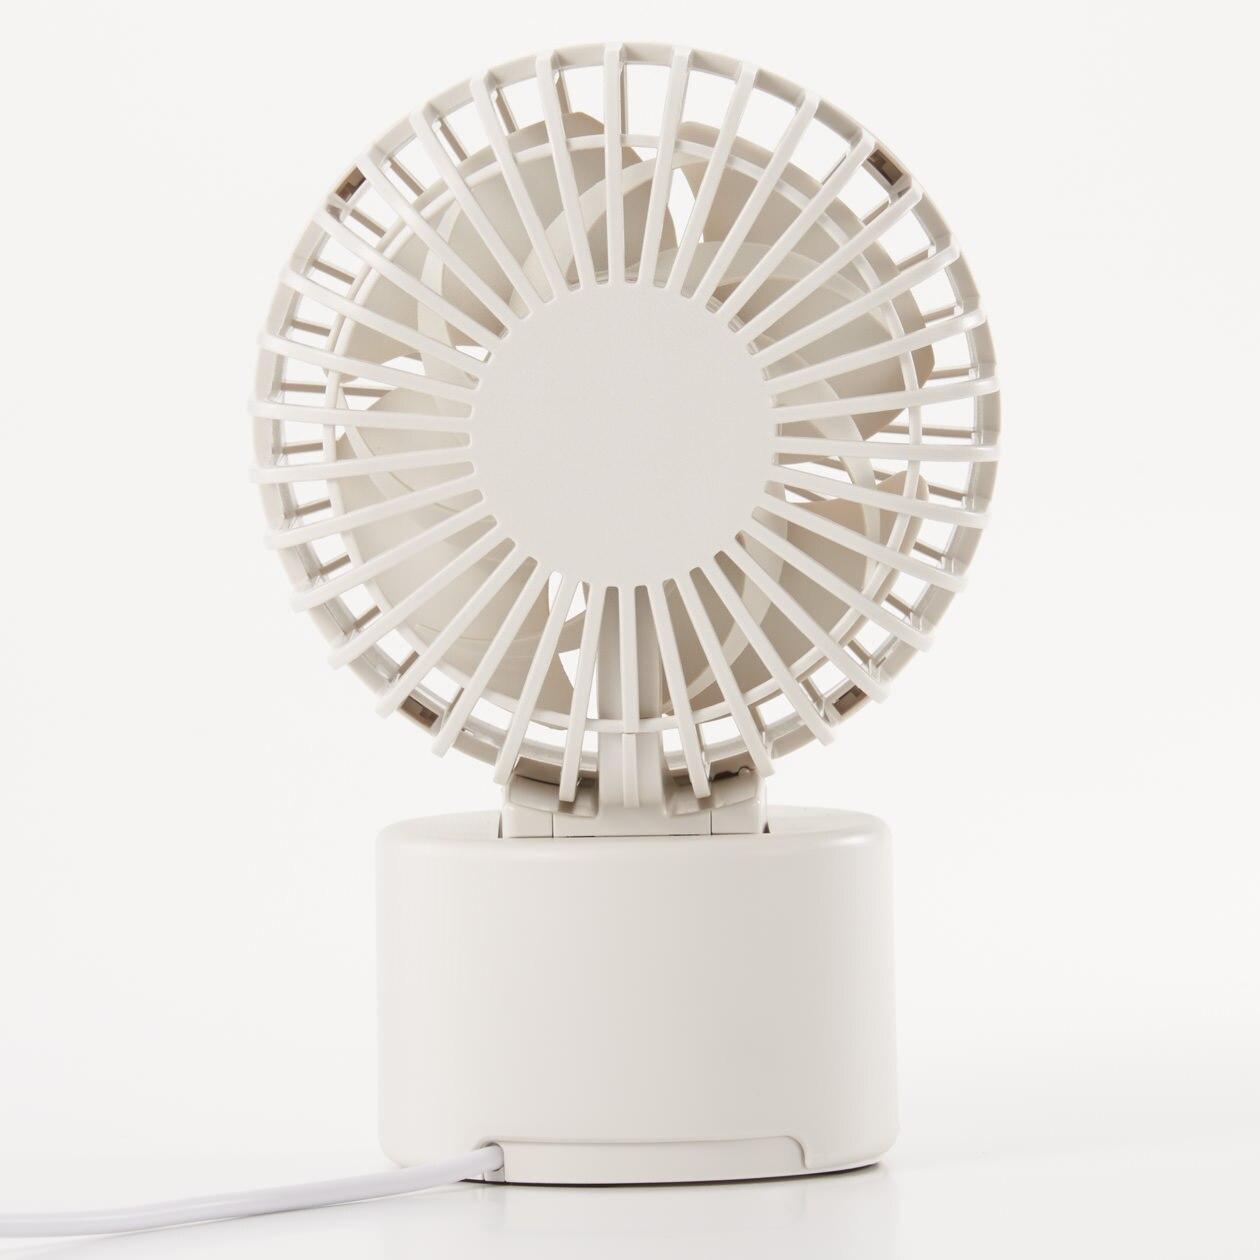 USB座檯風扇 - 轉動式 | 無印良品 MUJI